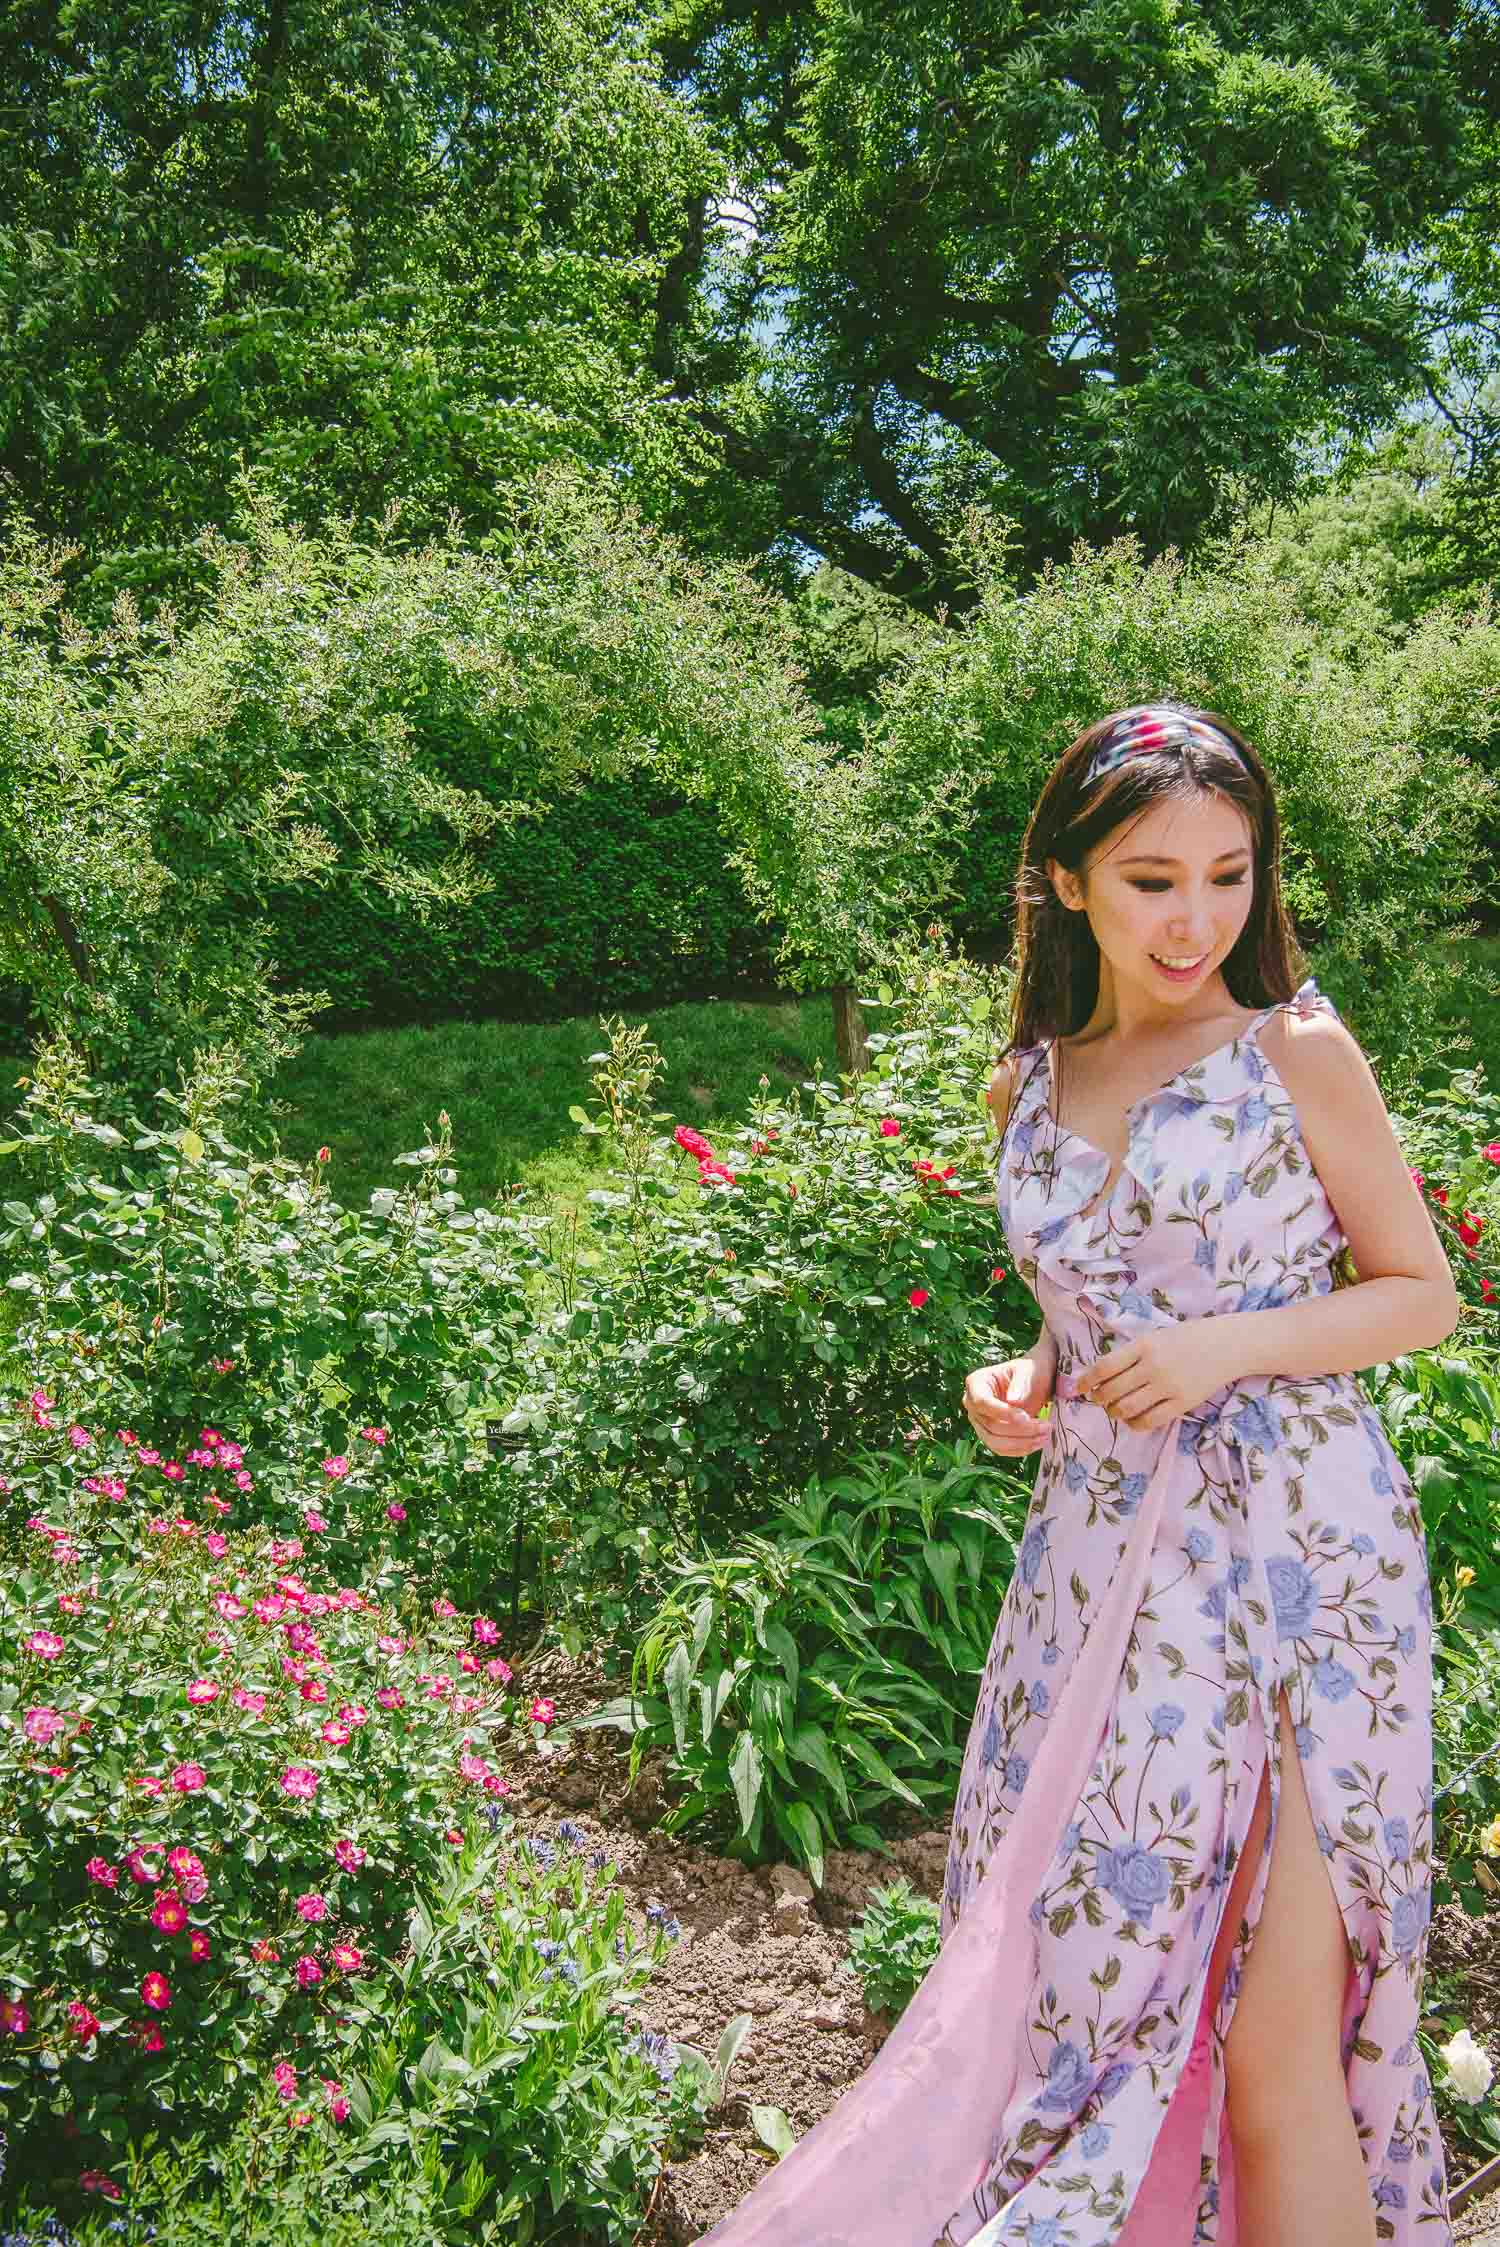 brooklyn rose garden 14